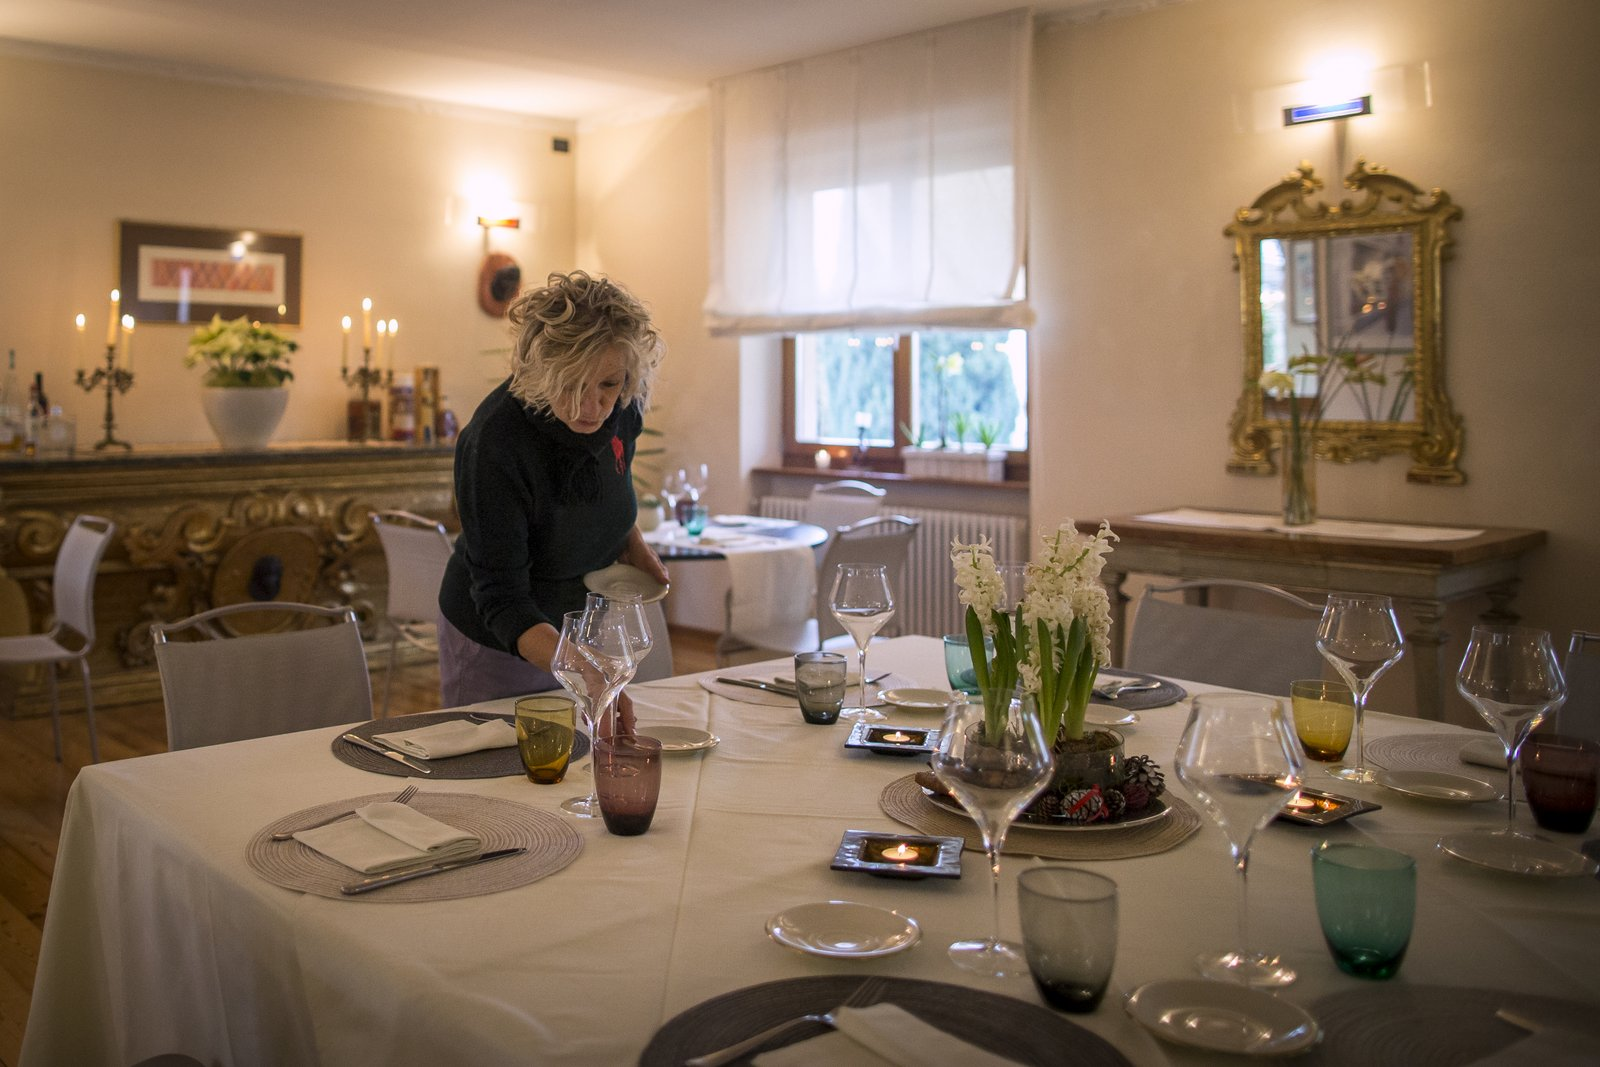 locanda-del-passatore-ristorante-valledicembra-23